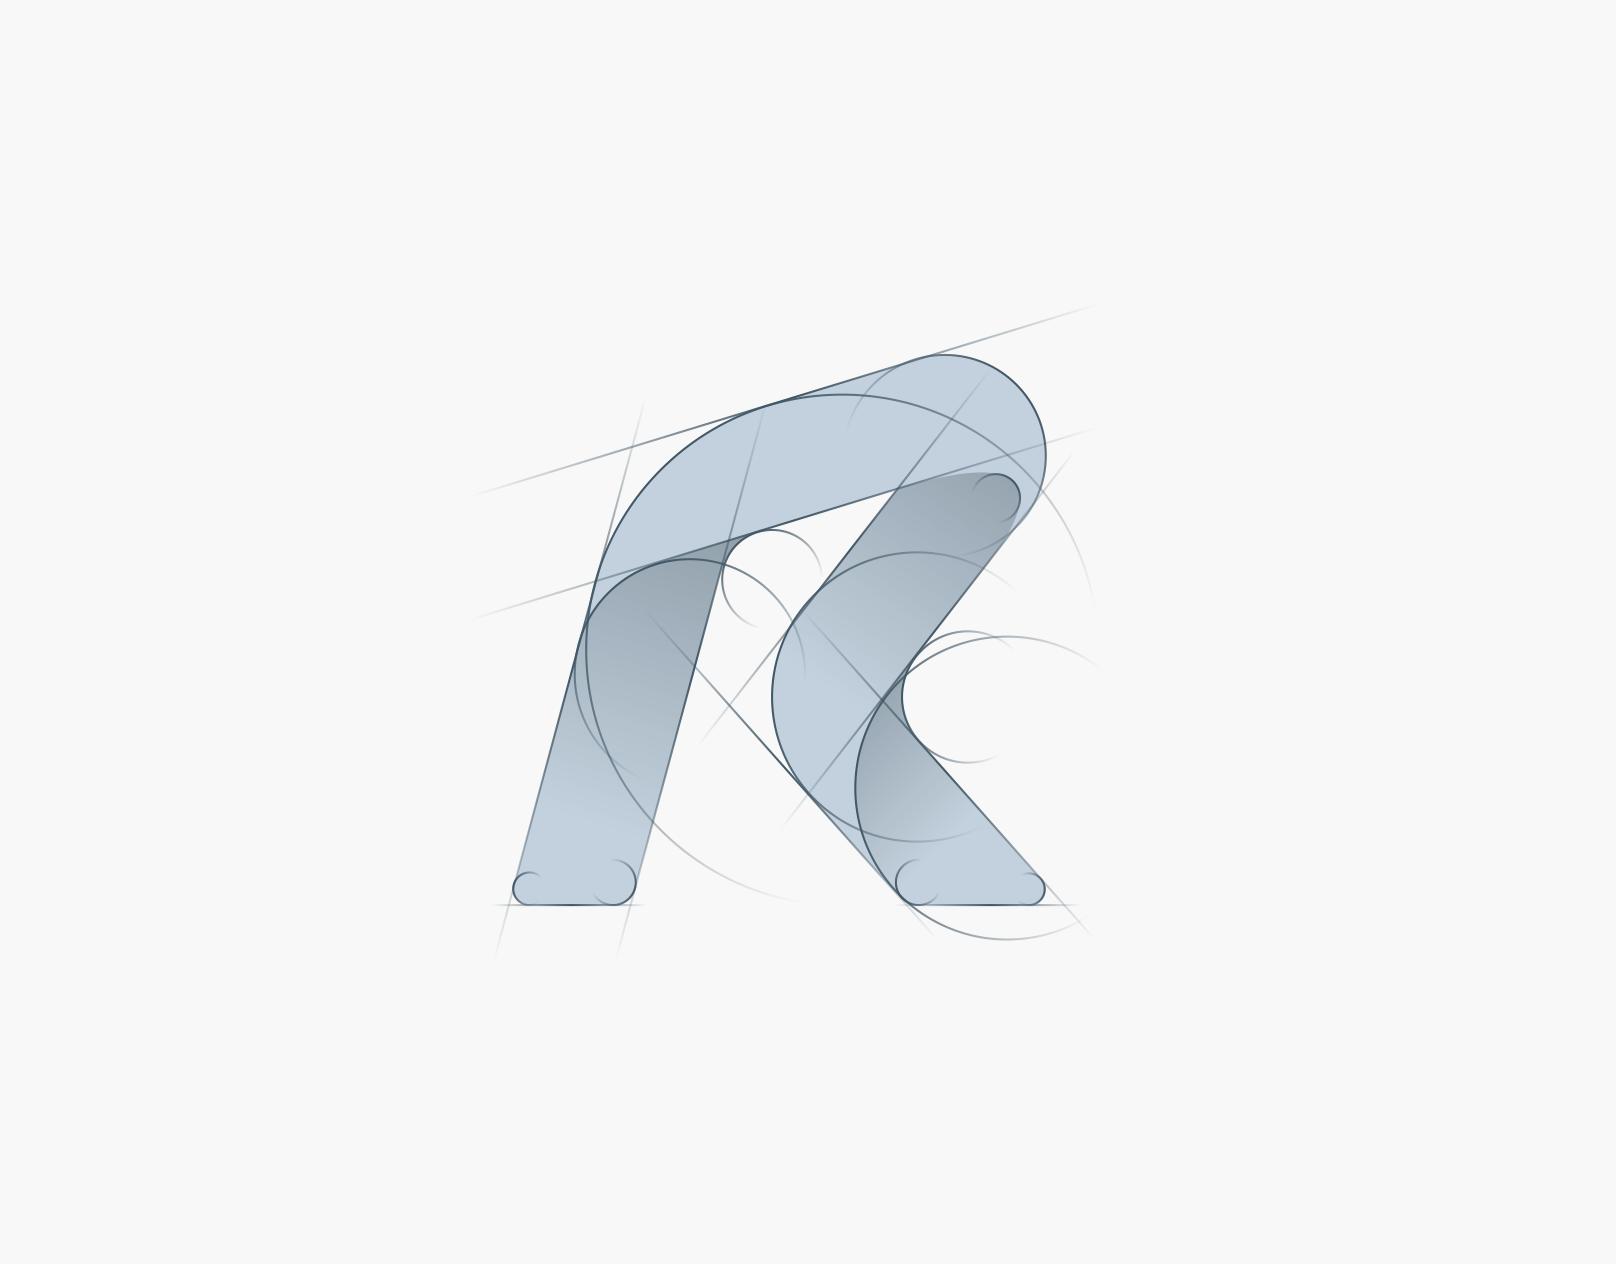 Tubik reborn logo contraction